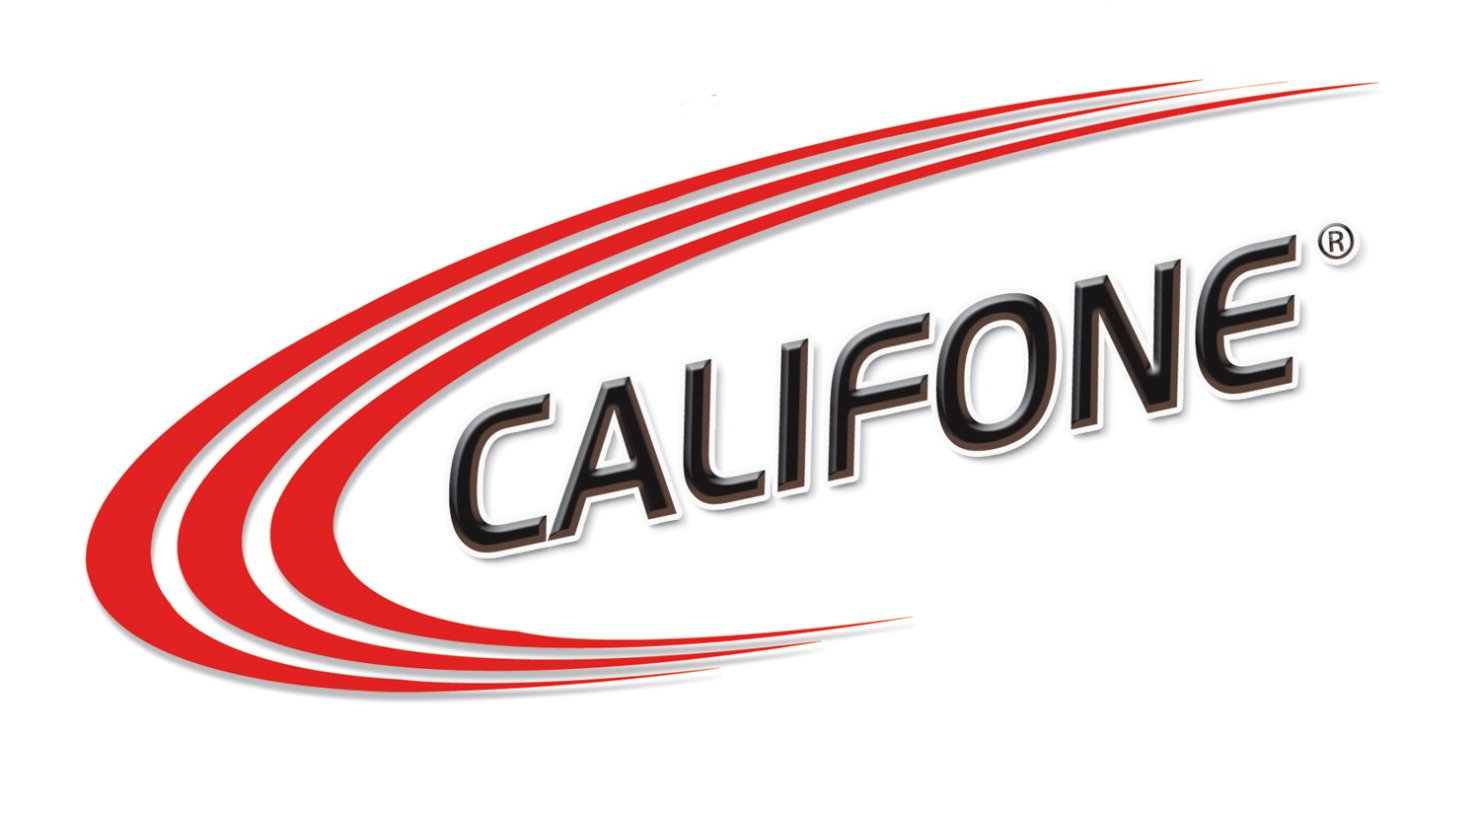 Califone ep-e3交換用Earcushion e2 and e3 Earbud Headphones – Pk / 50ペア   B072PZ5473